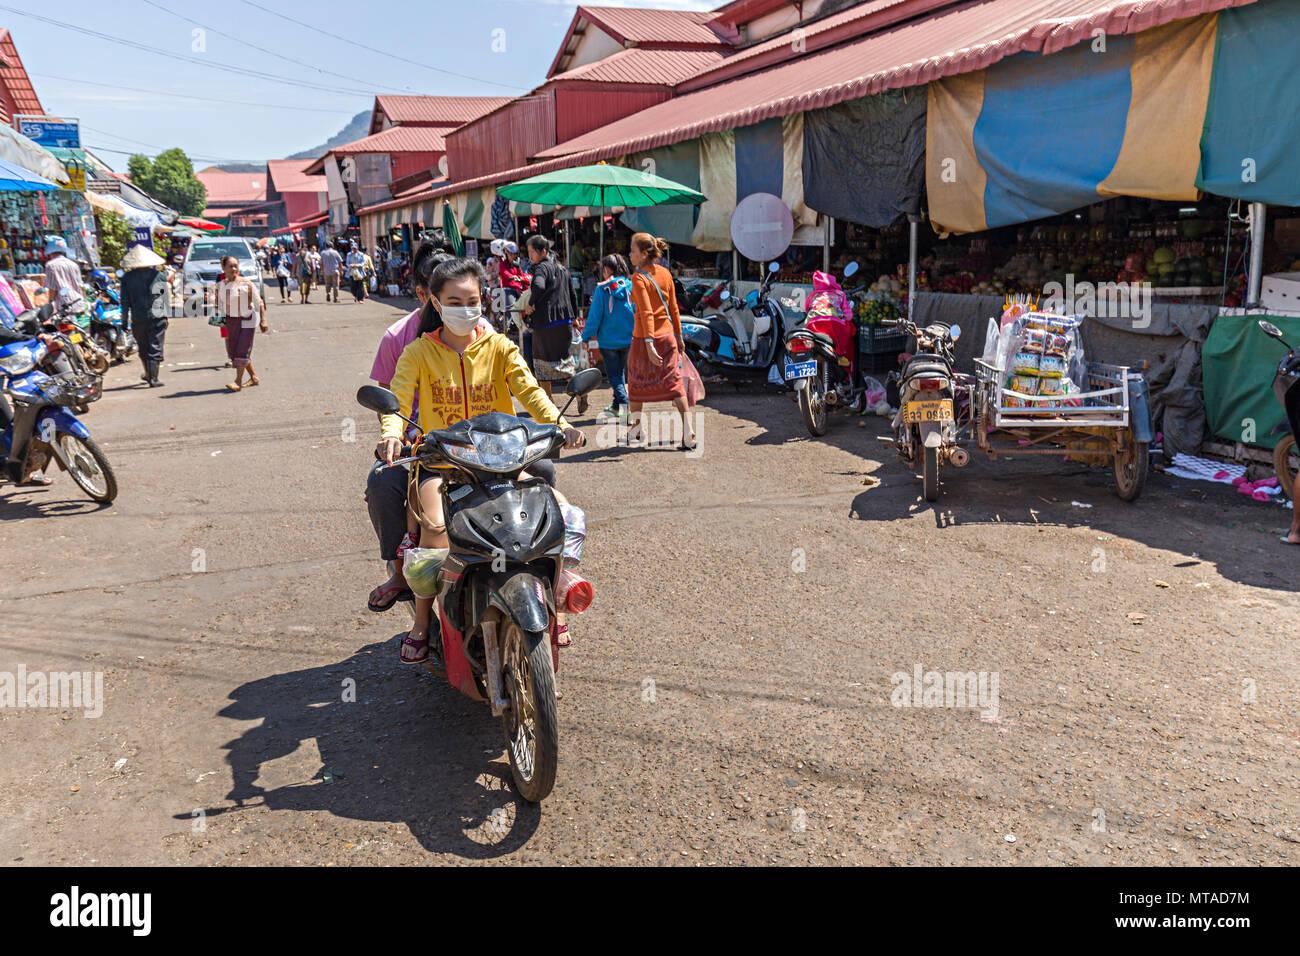 Woman warking face mask riding scooter through market, Pakse, Laos - Stock Image